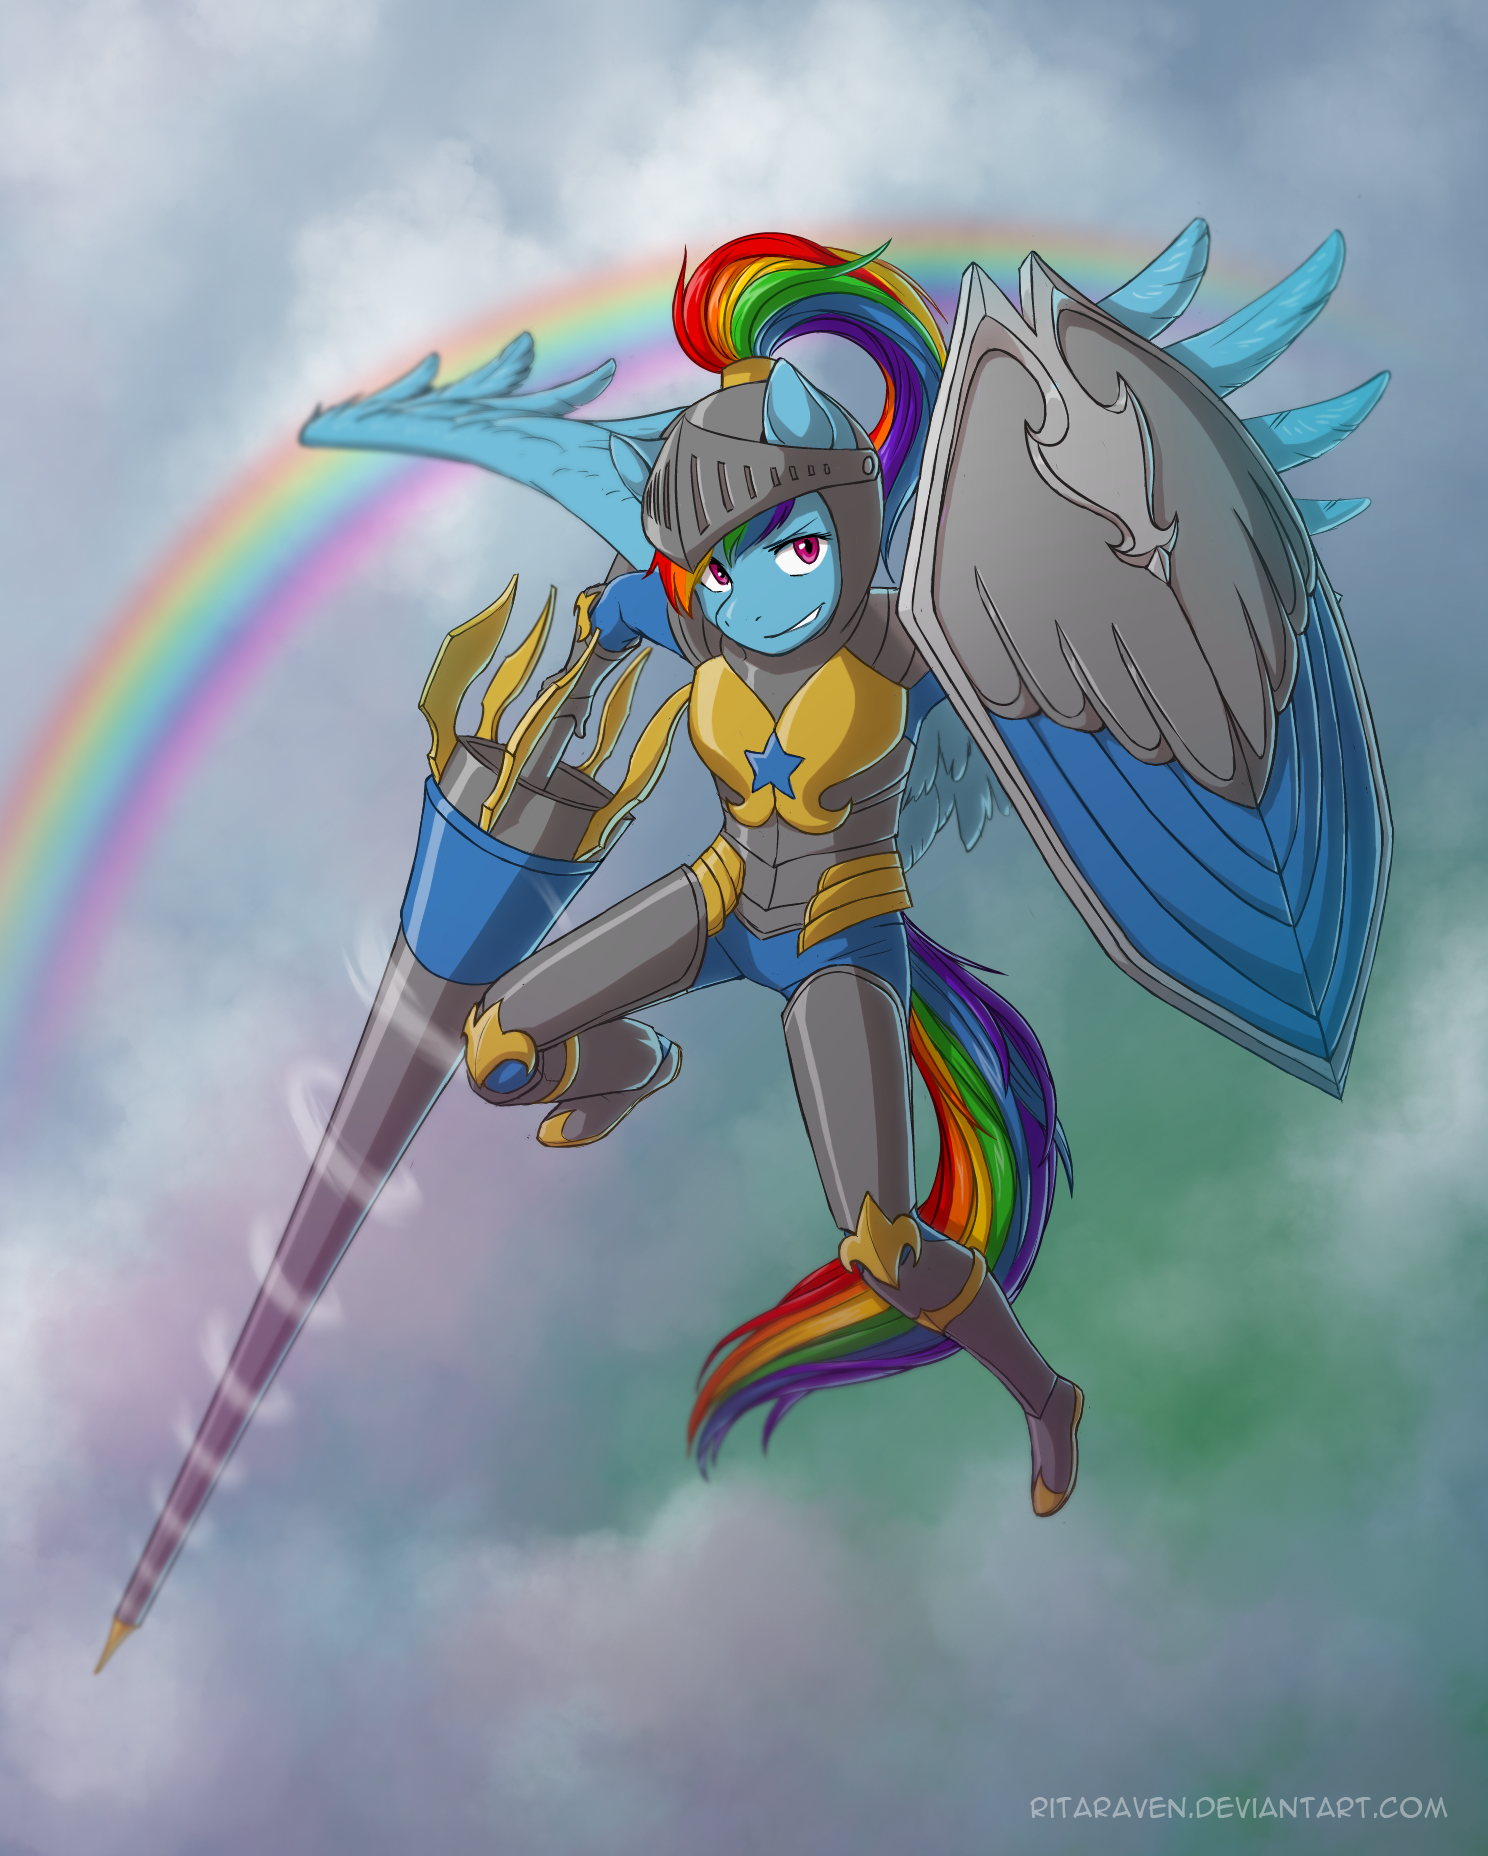 Warriors Of The Rainbow 2 Vietsub: #1130691: Jay-kuro